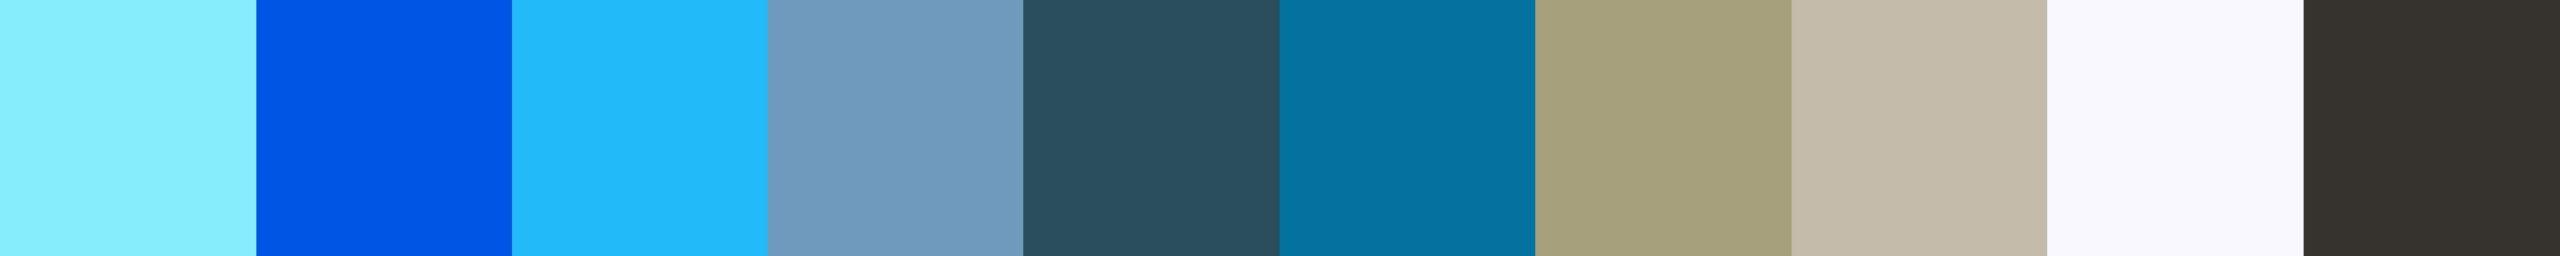 79 Mahavia Color Palette